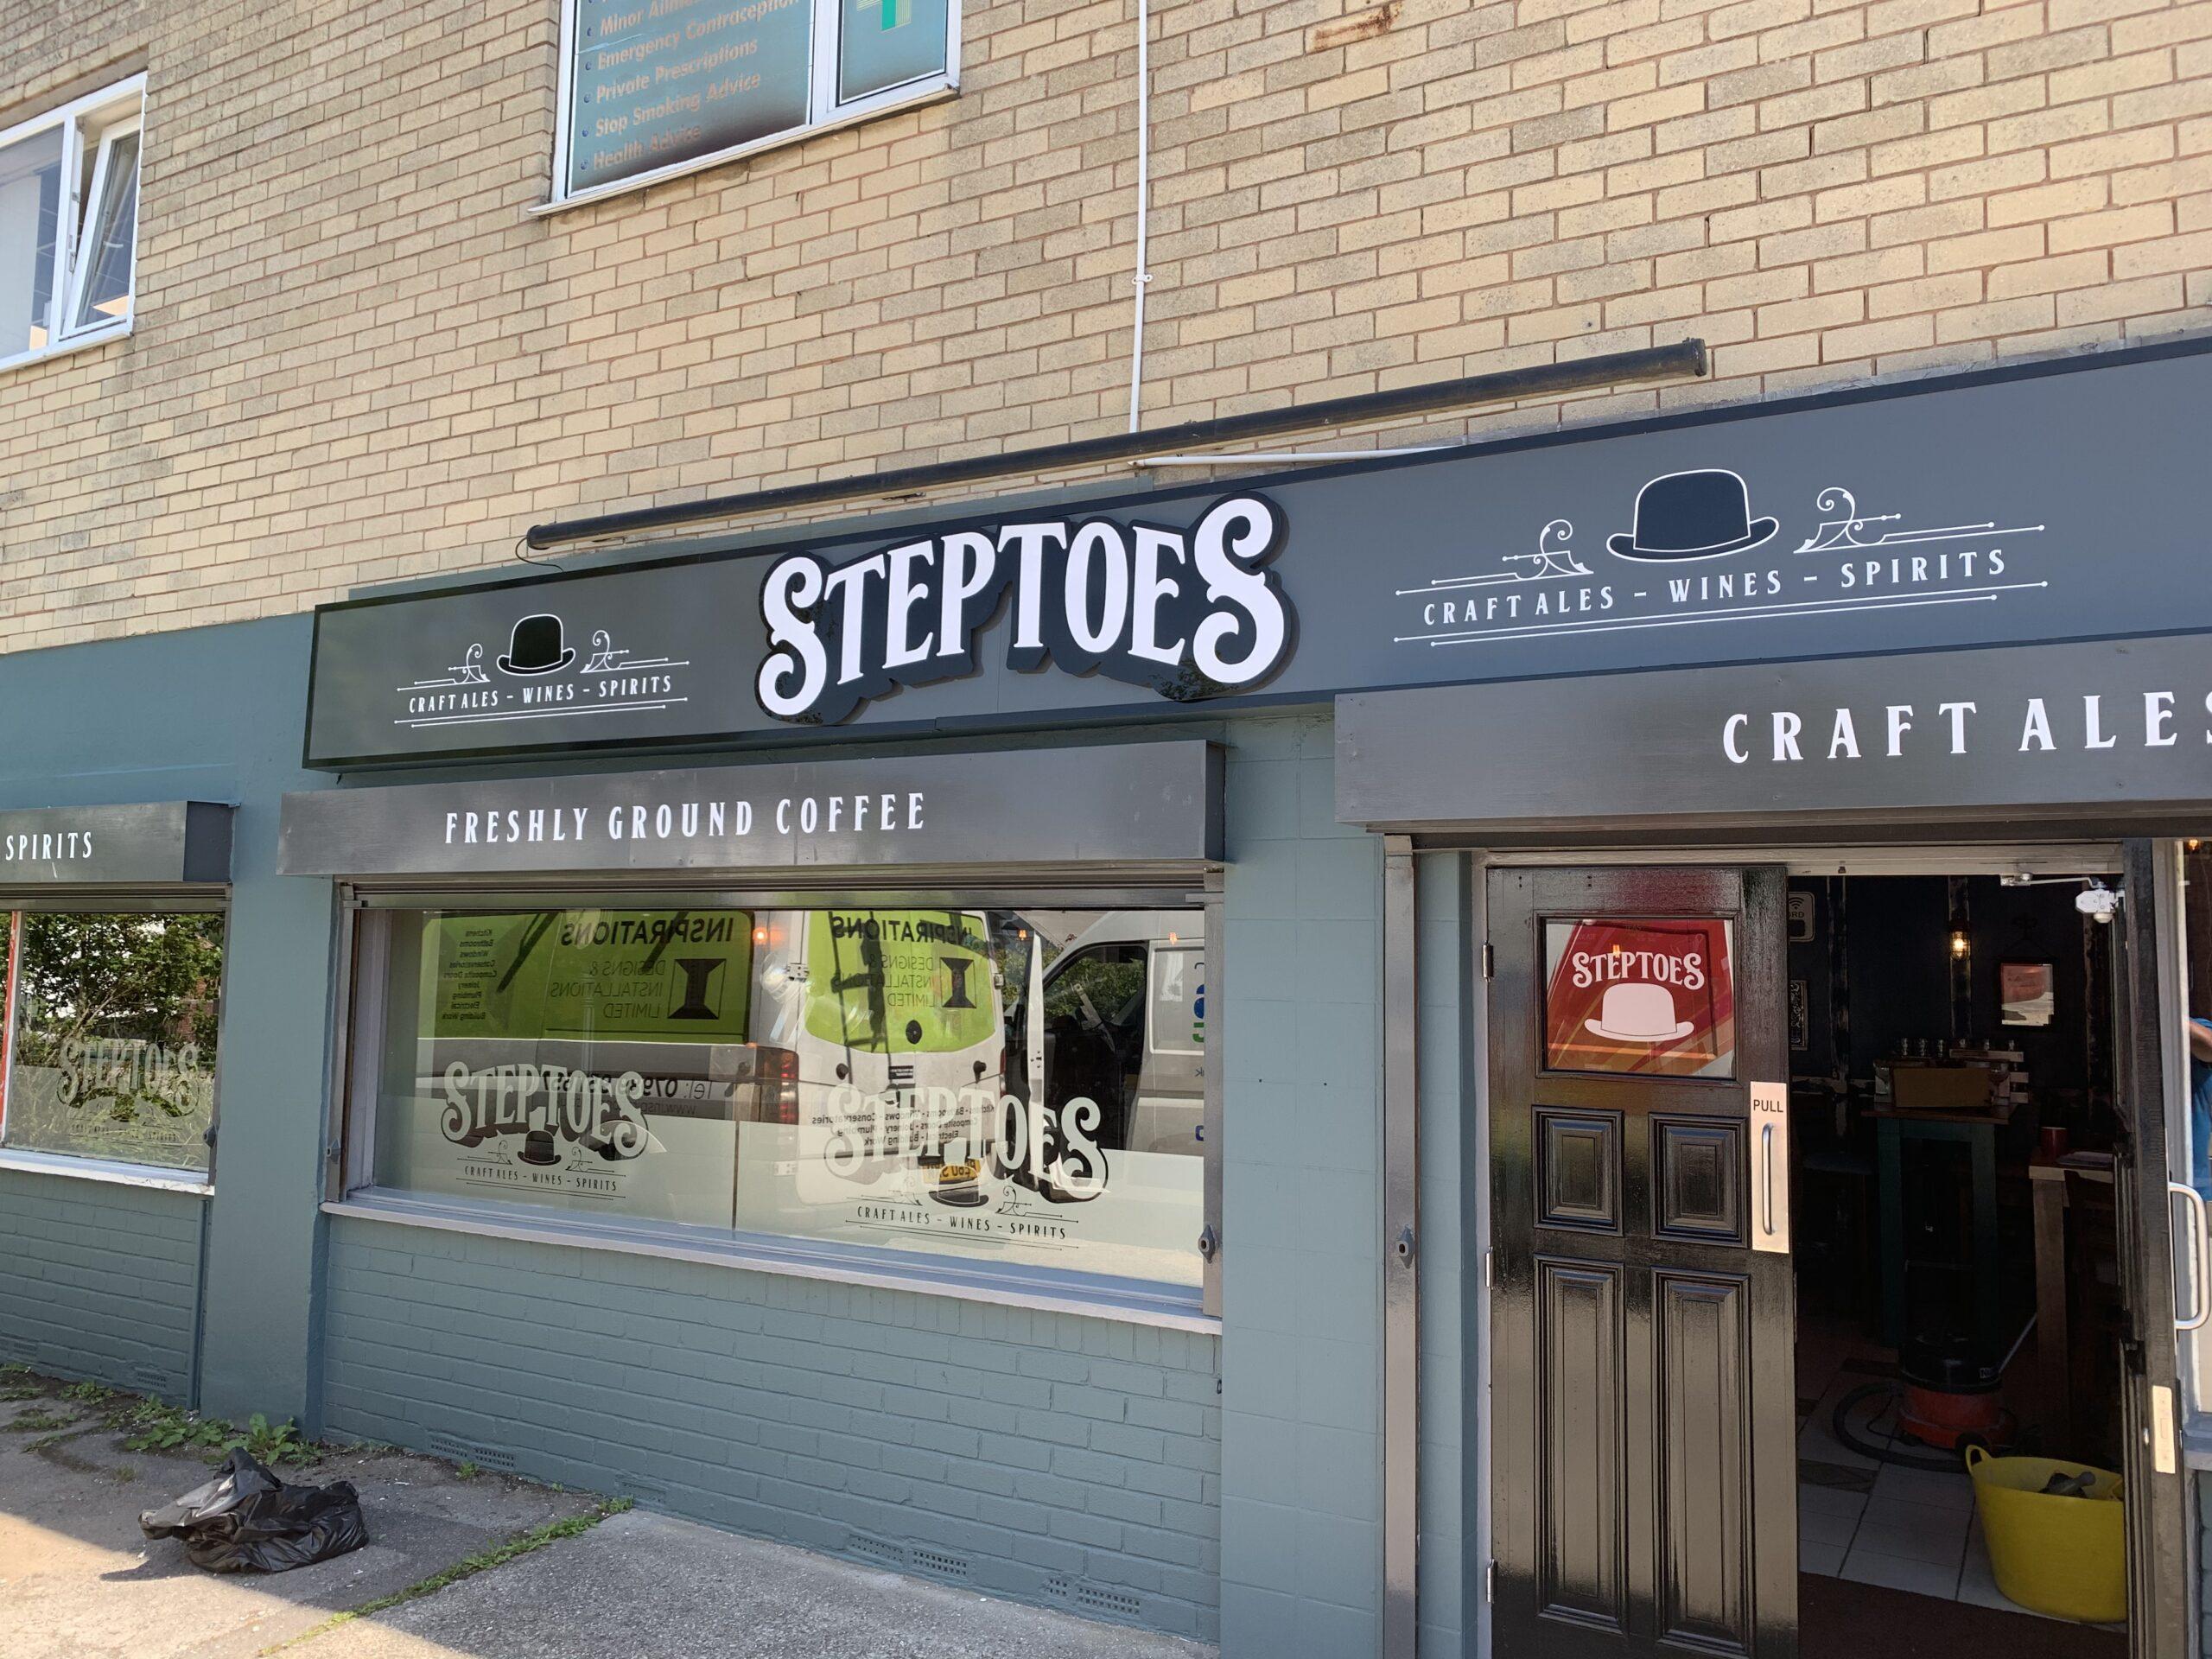 Steptoes Signage Sheffield